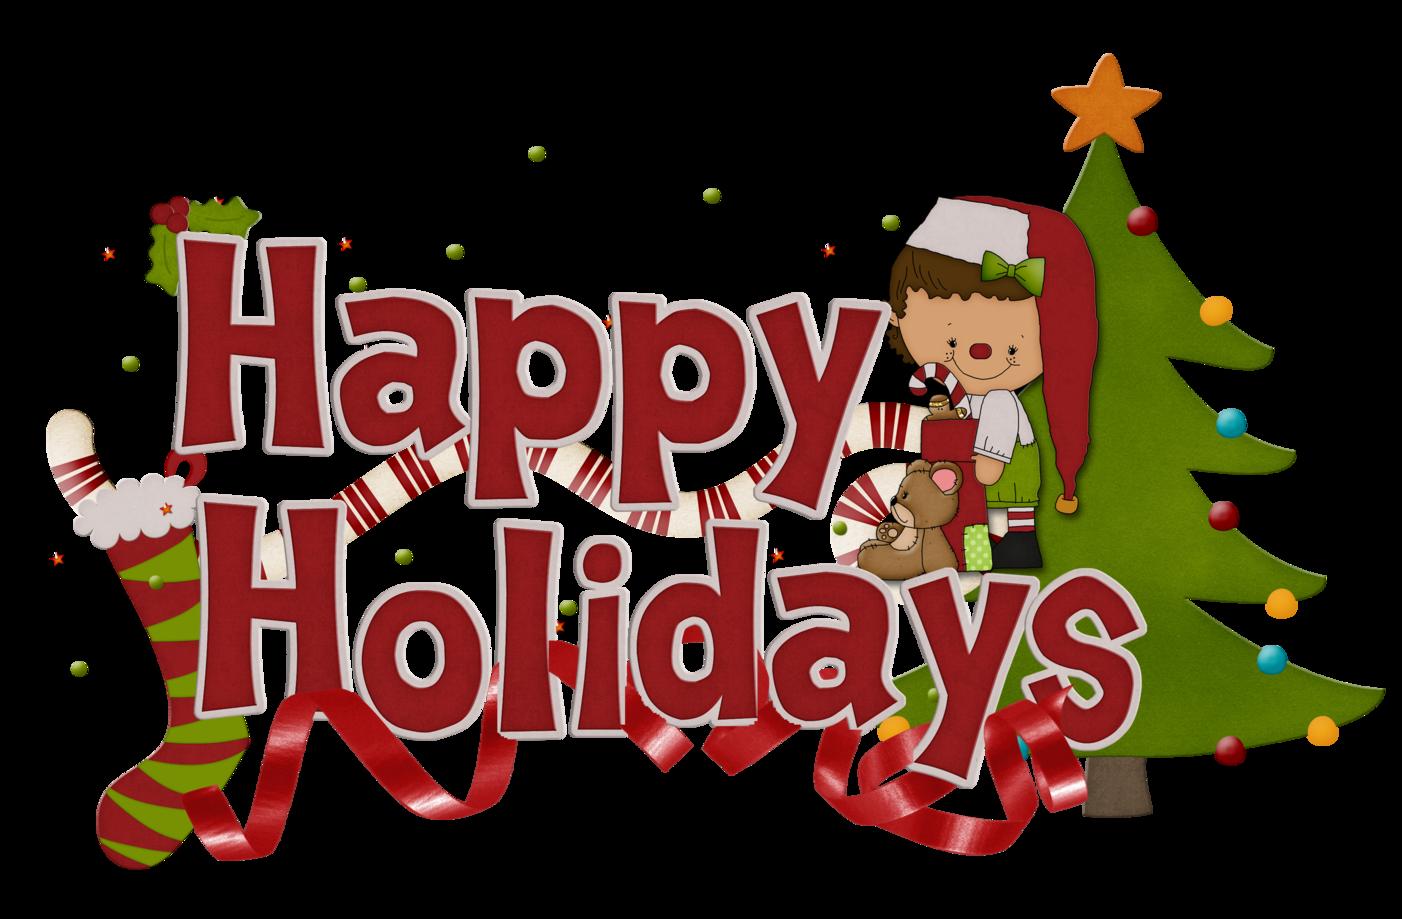 Christmas Holidays Clipart.Holiday Clipart Happy Hour 5 Christmas Happy Holidays